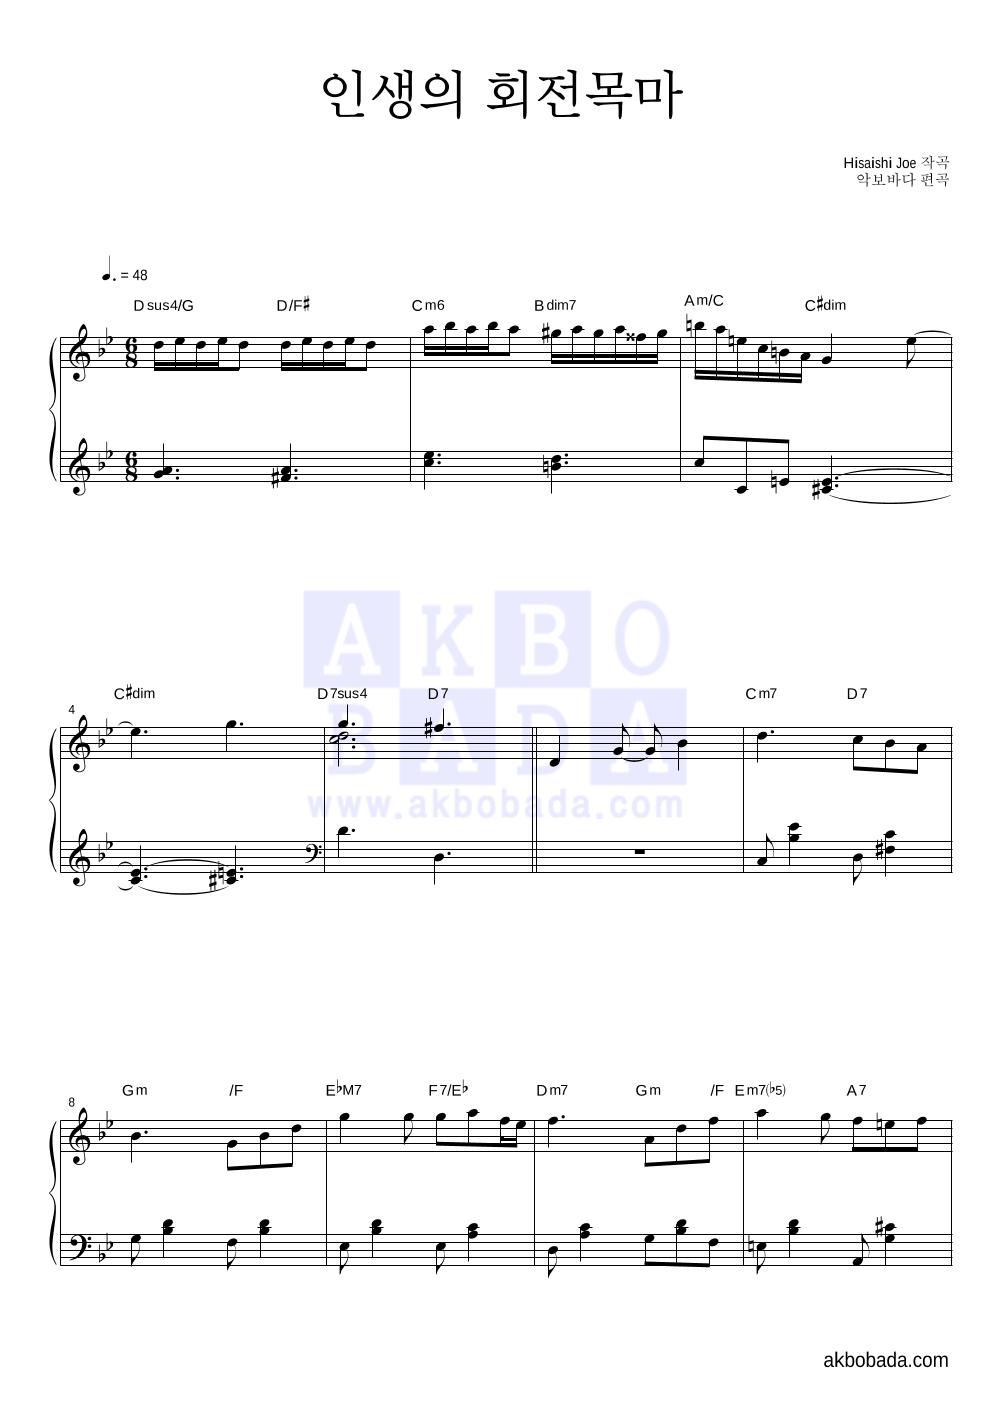 Hisaishi Joe - 인생의 회전목마 피아노 마스터 악보